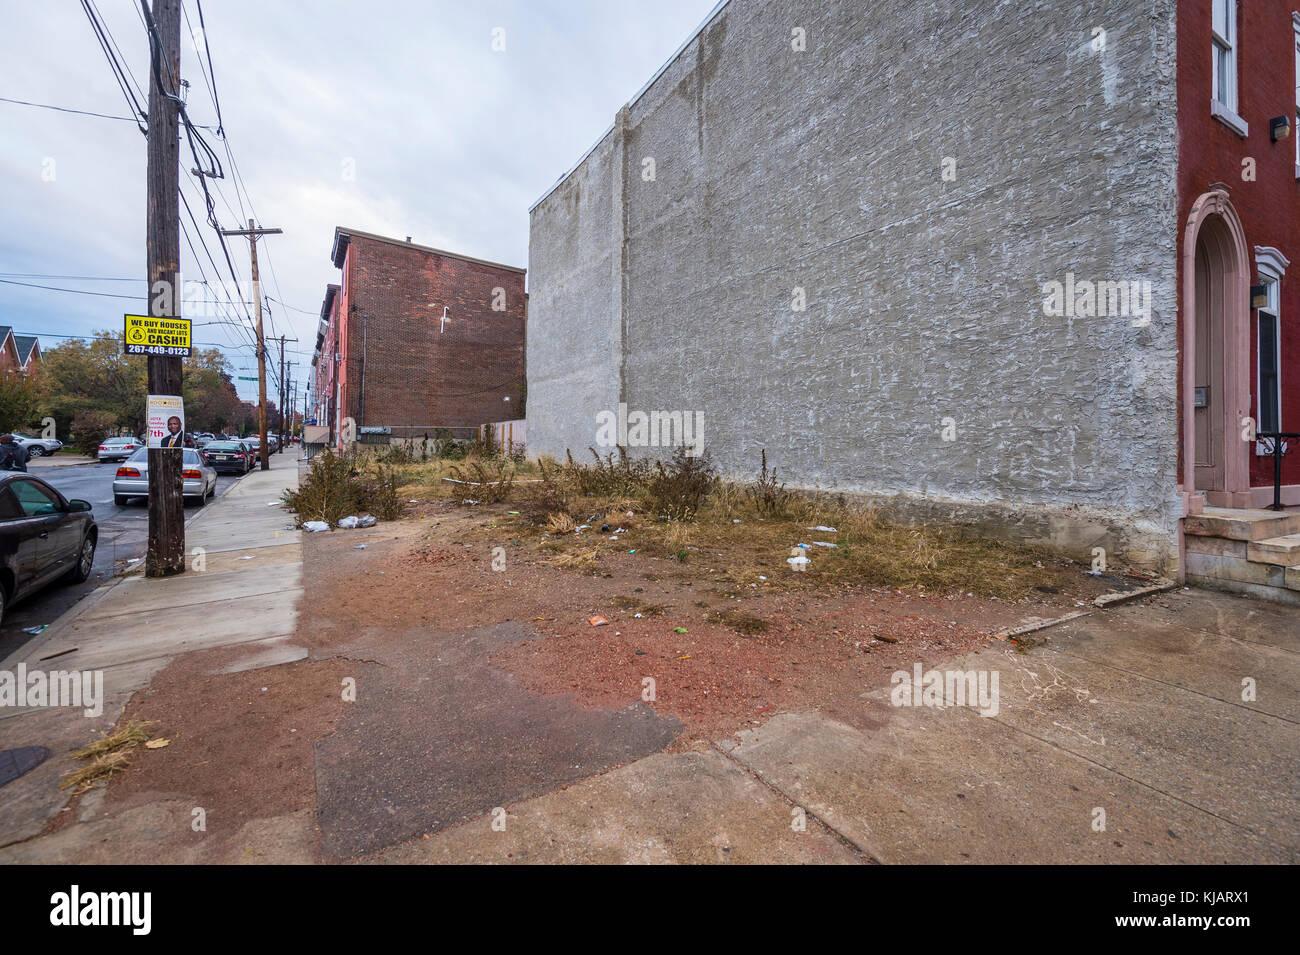 Vacant Lot, Philadelphia, PA USA - Stock Image